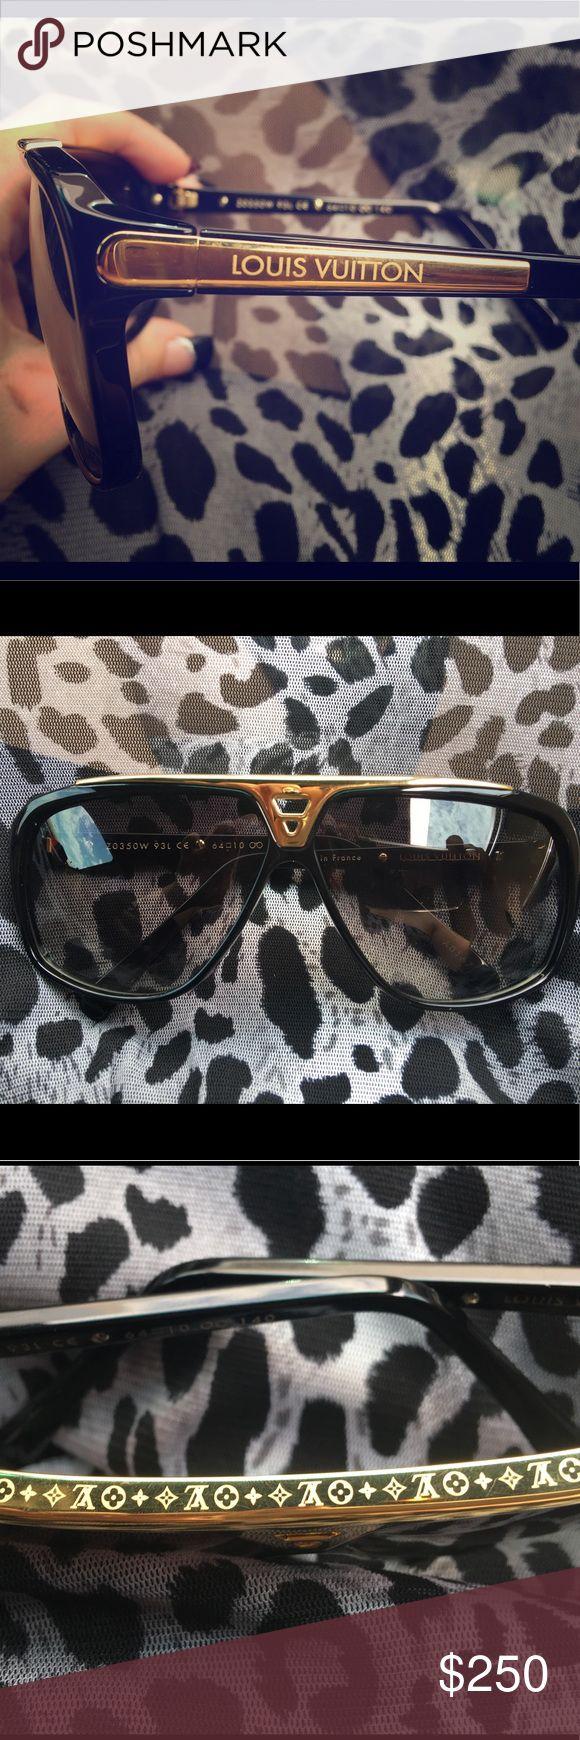 Louis Vuitton Evidence sunglasses Louis Vuitton Evidence sunglasses BRAND NEW (glasses only) Perfect condition, not one scratch From the Louis Vuitton store Retail $800 Louis Vuitton Accessories Sunglasses